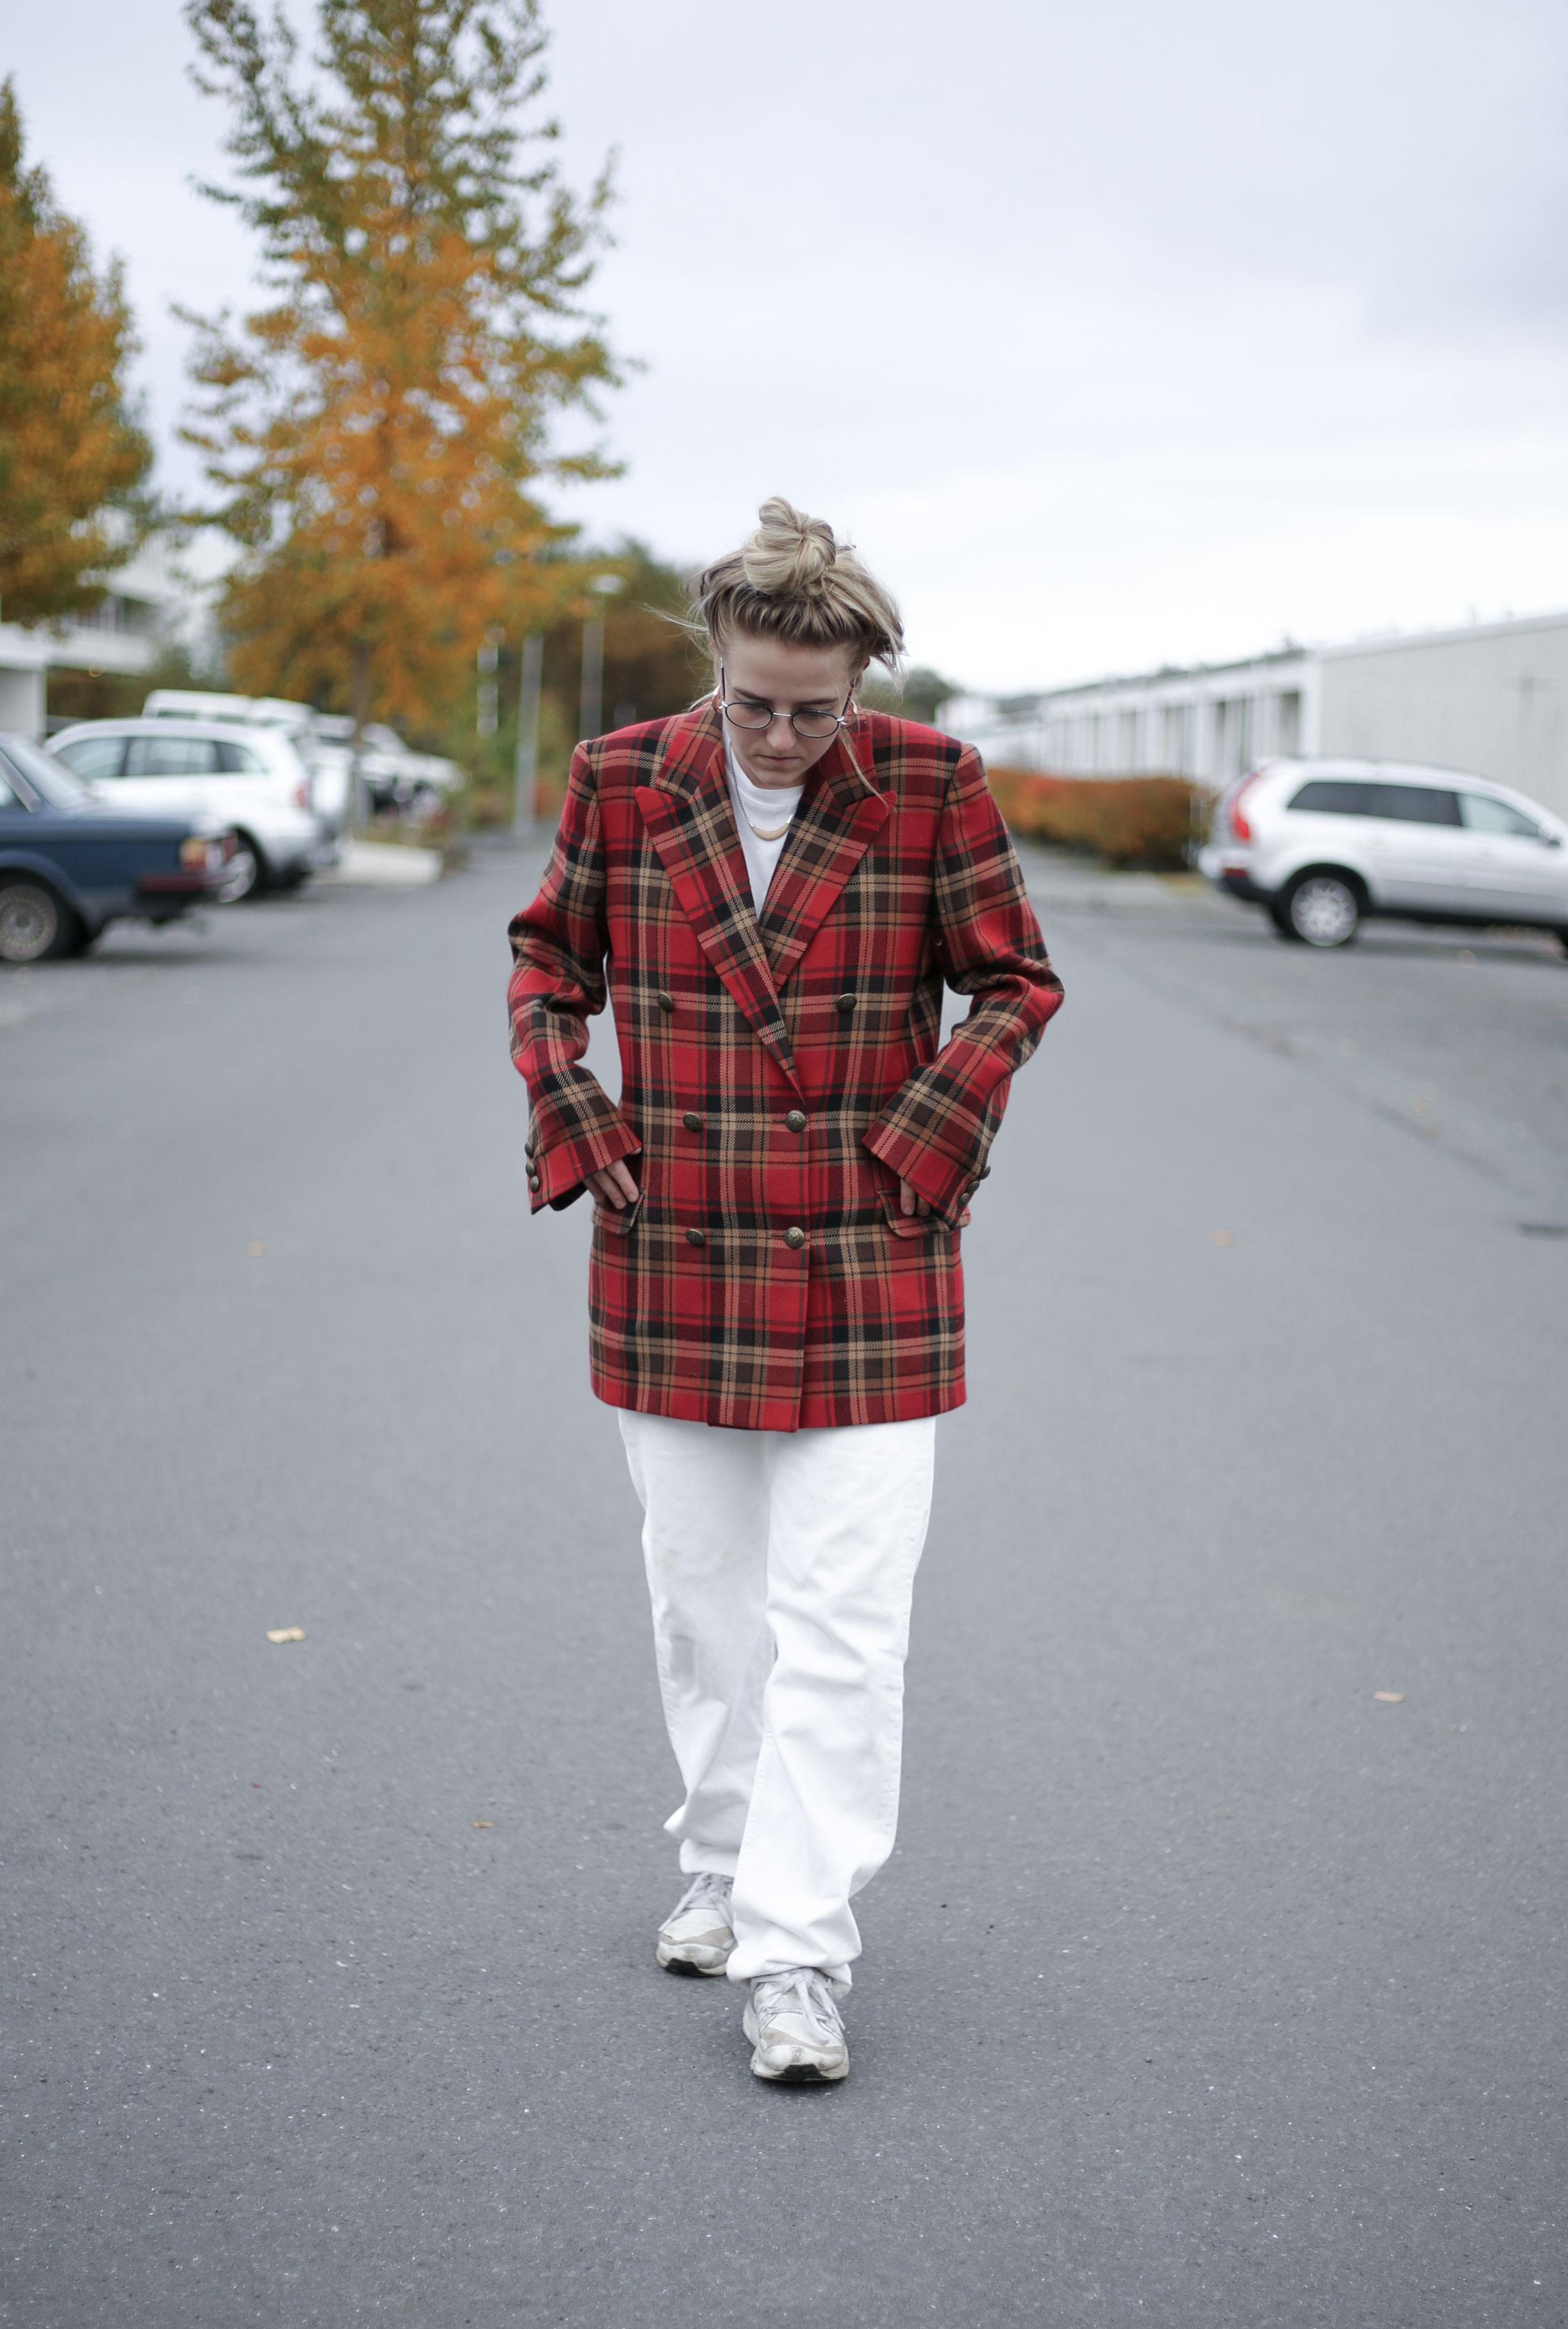 reykjavik_8_streetstyle_thestreetland_streetland_bryndis_thorsteinsdottir_fashion_nordic_citystye_mode.jpg.jpg